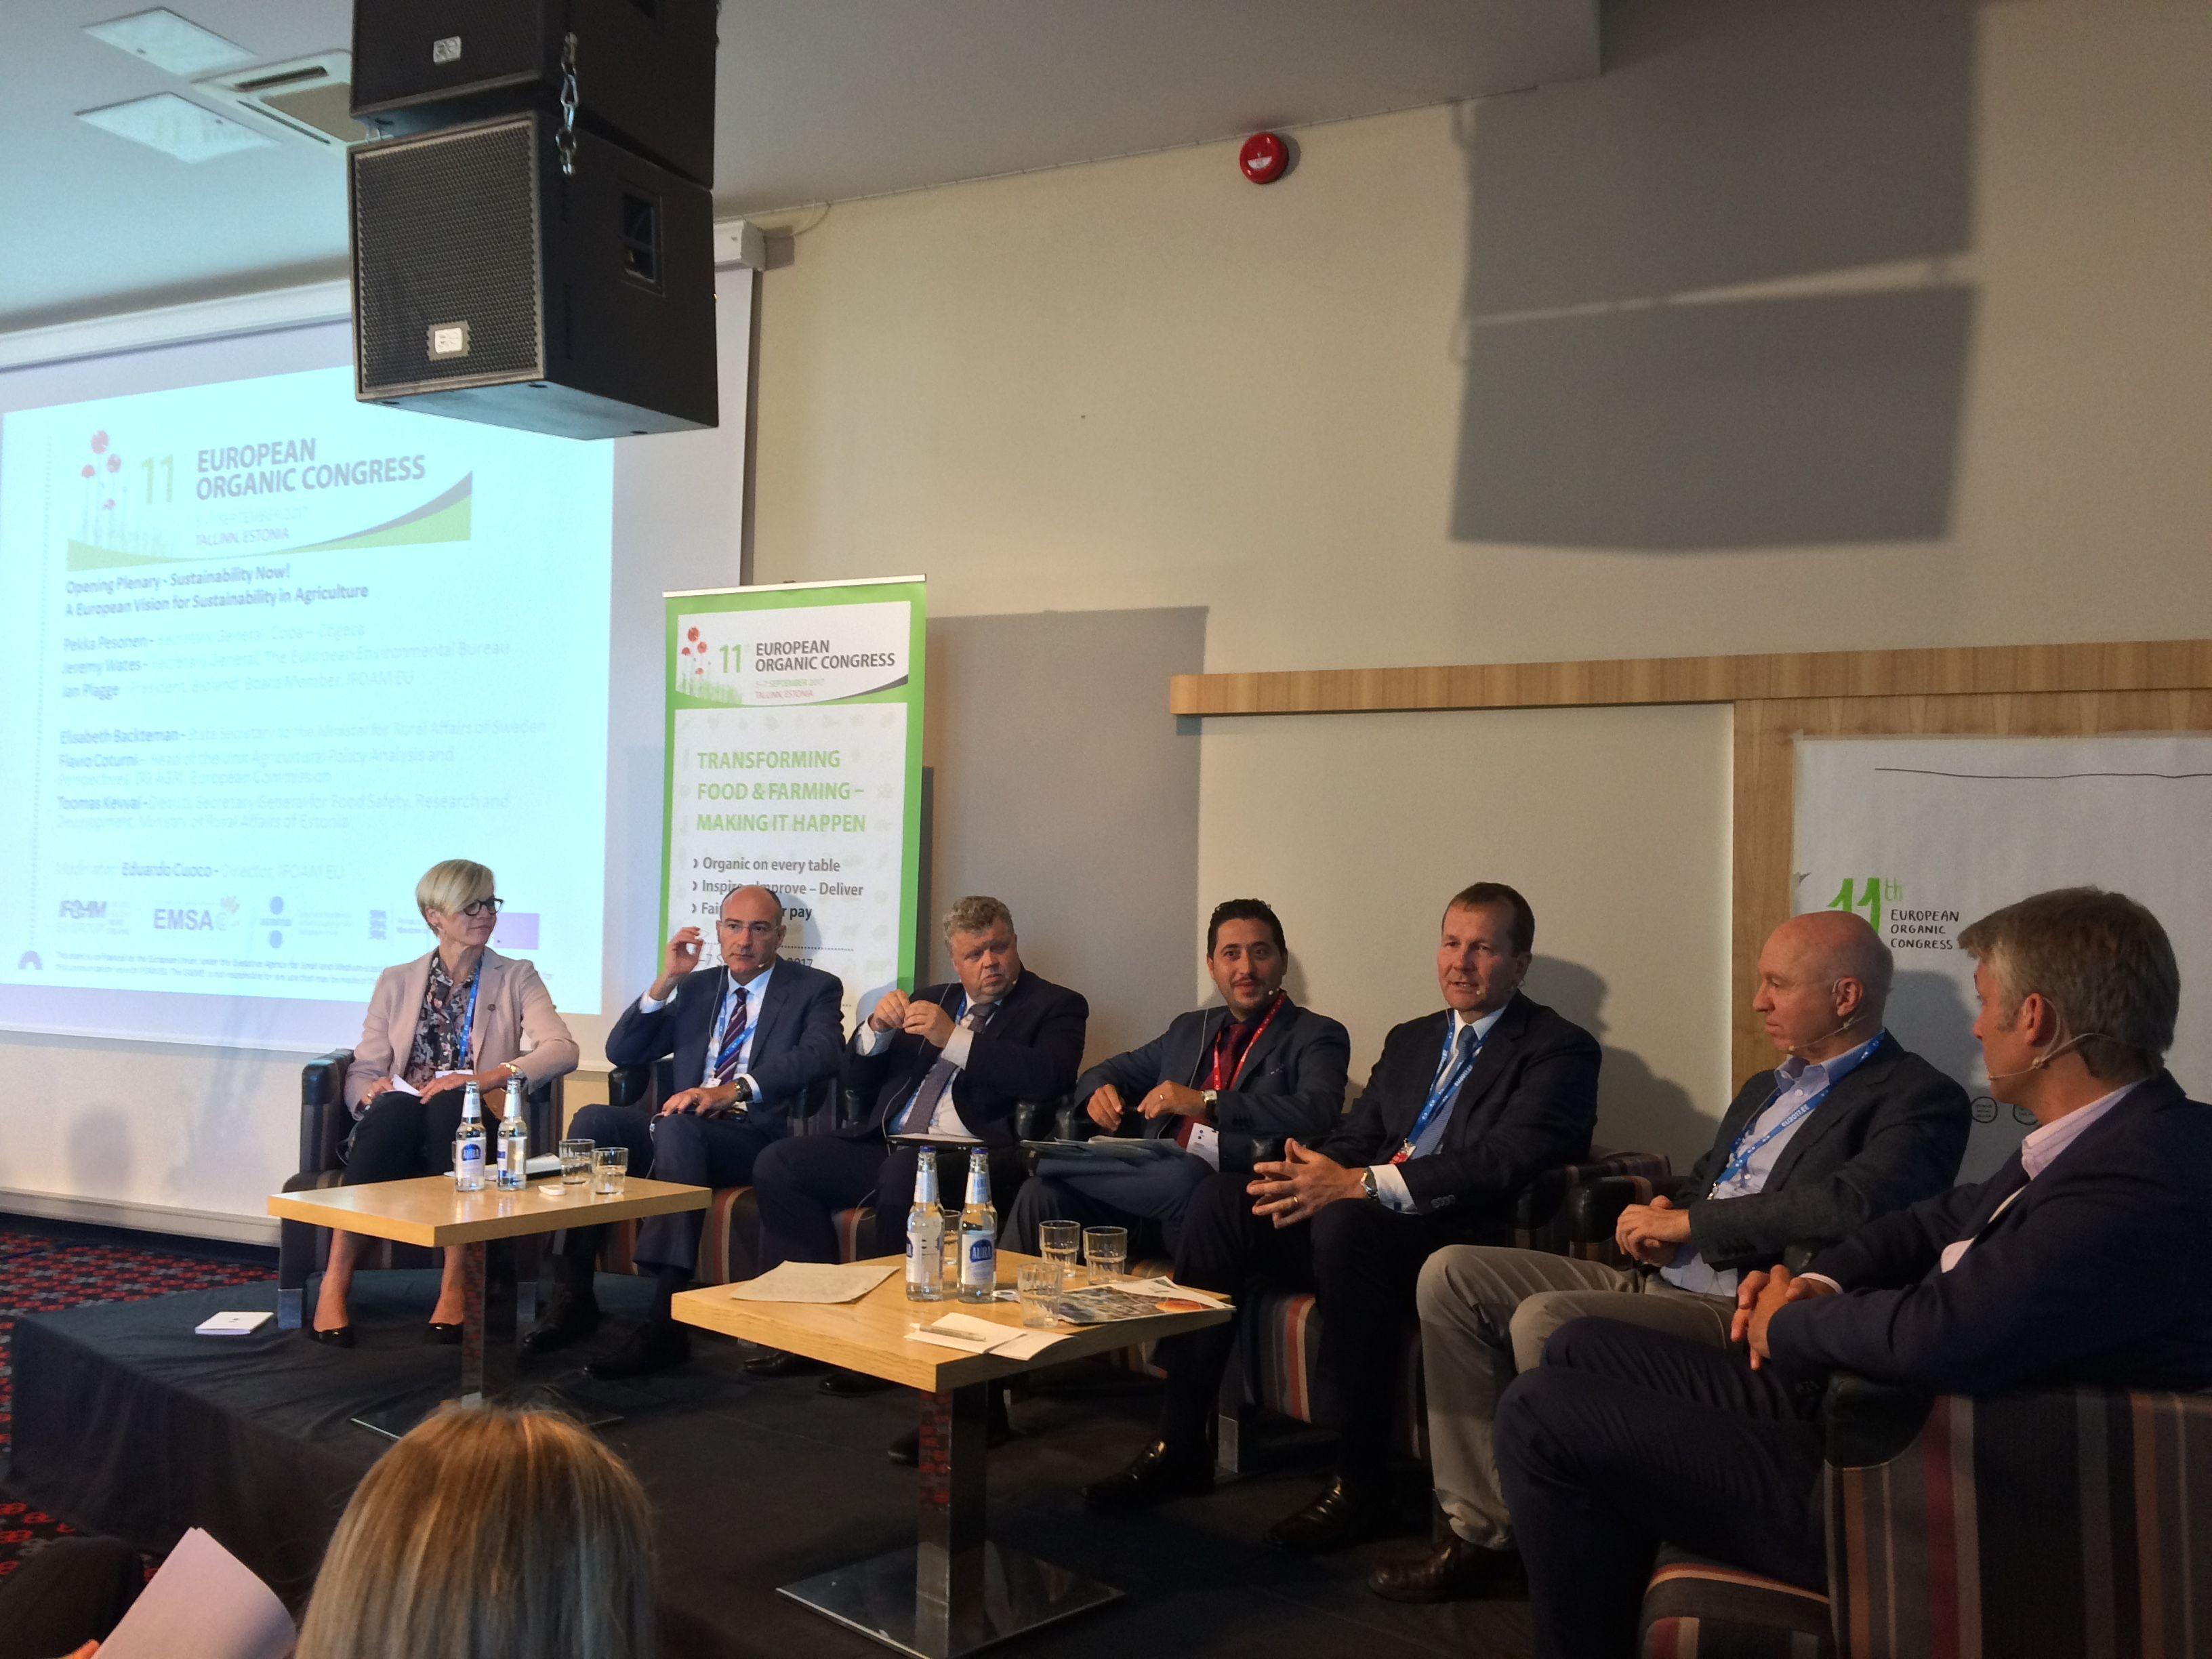 Opening Plenary - Sustainability Now! With Elisabeth Backteman, Flavio Coturni, Toomas Kevvai, Eduardo Cuoco (moderator), Pekka Personen Jeremy Wates and Jan Plagge